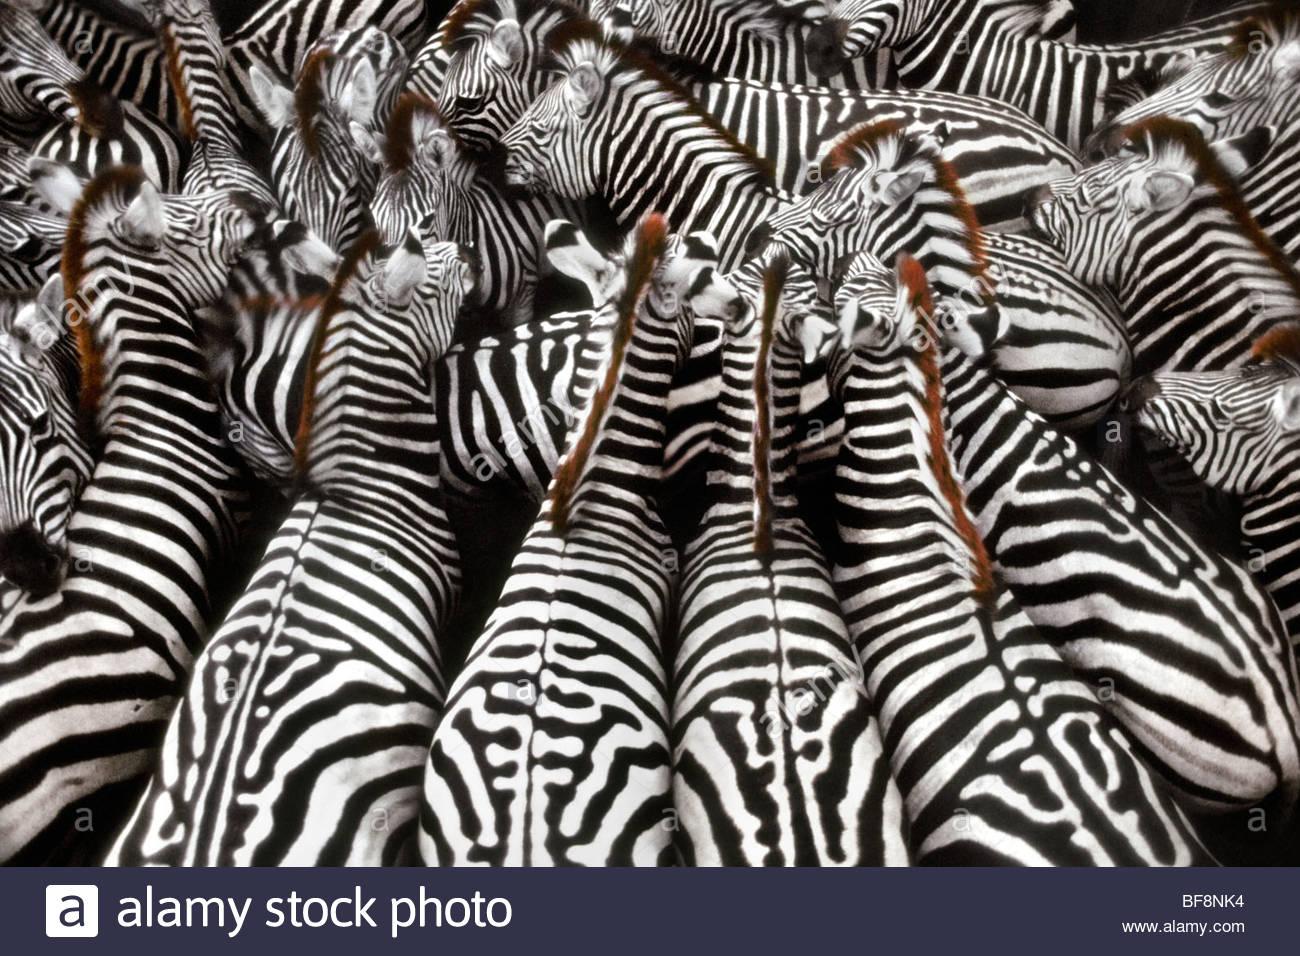 Zebras rounded up for transport, Equus quagga, Okavango Delta, Botswana - Stock Image